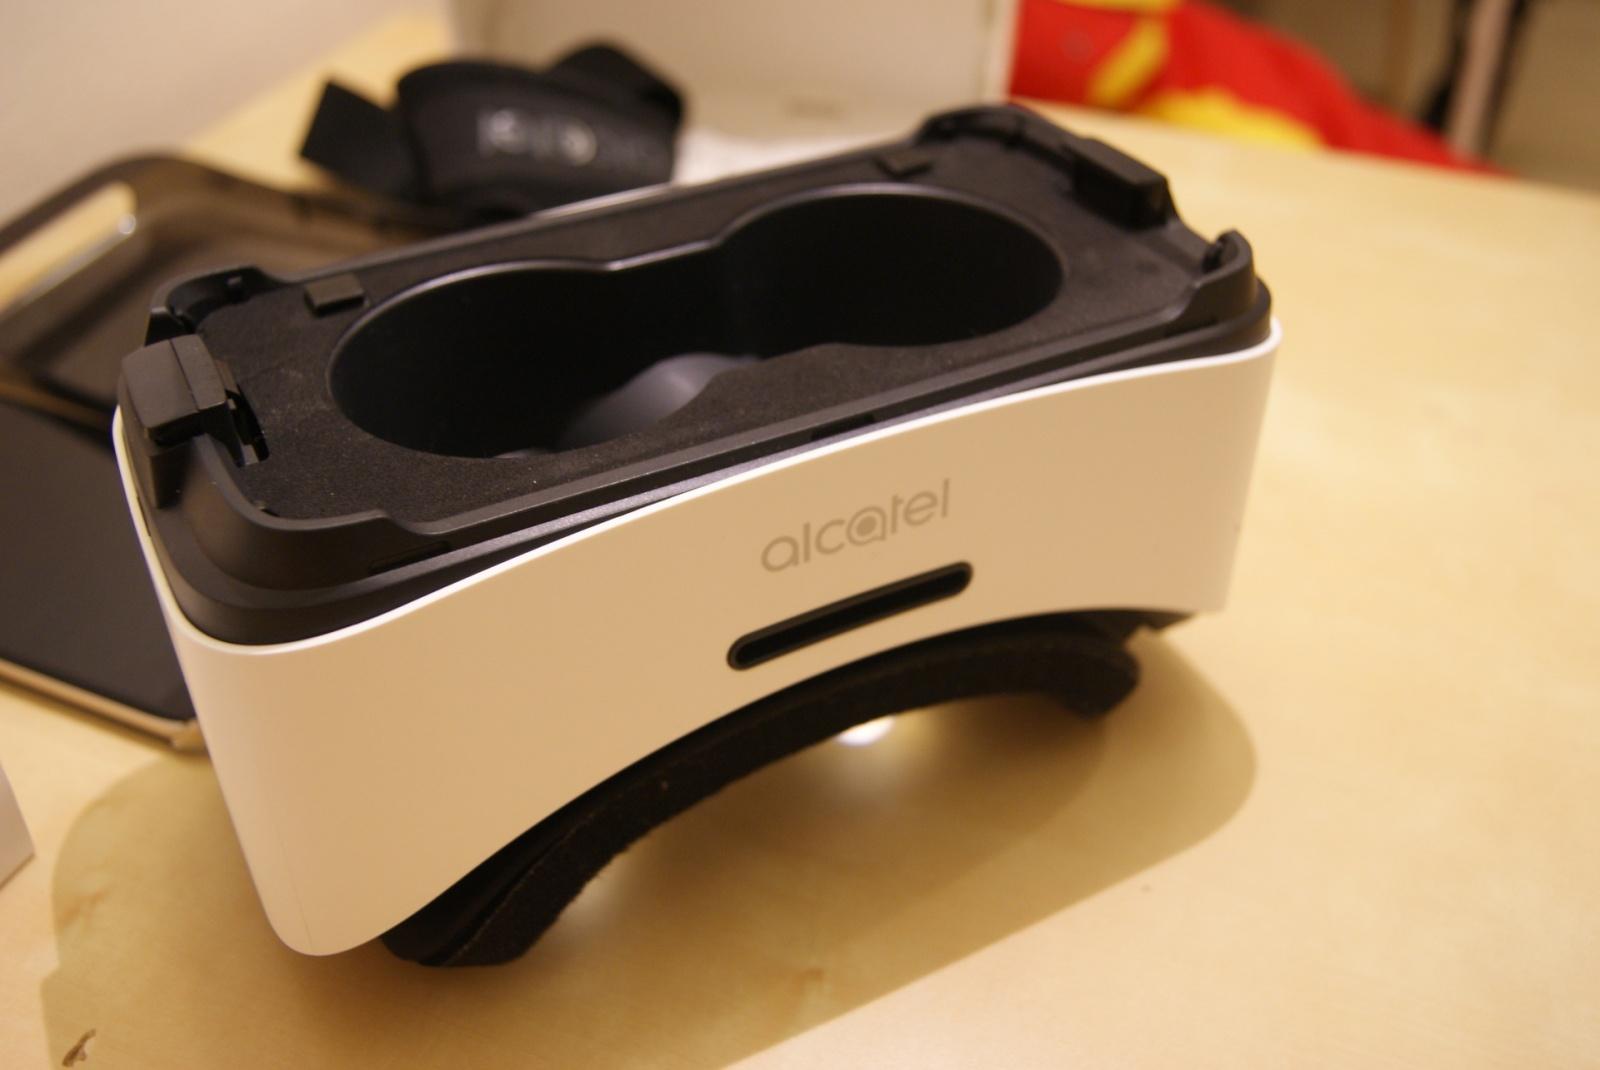 Обзор Alcatel IDOL 4S: виртуальная реальность из коробки - 18